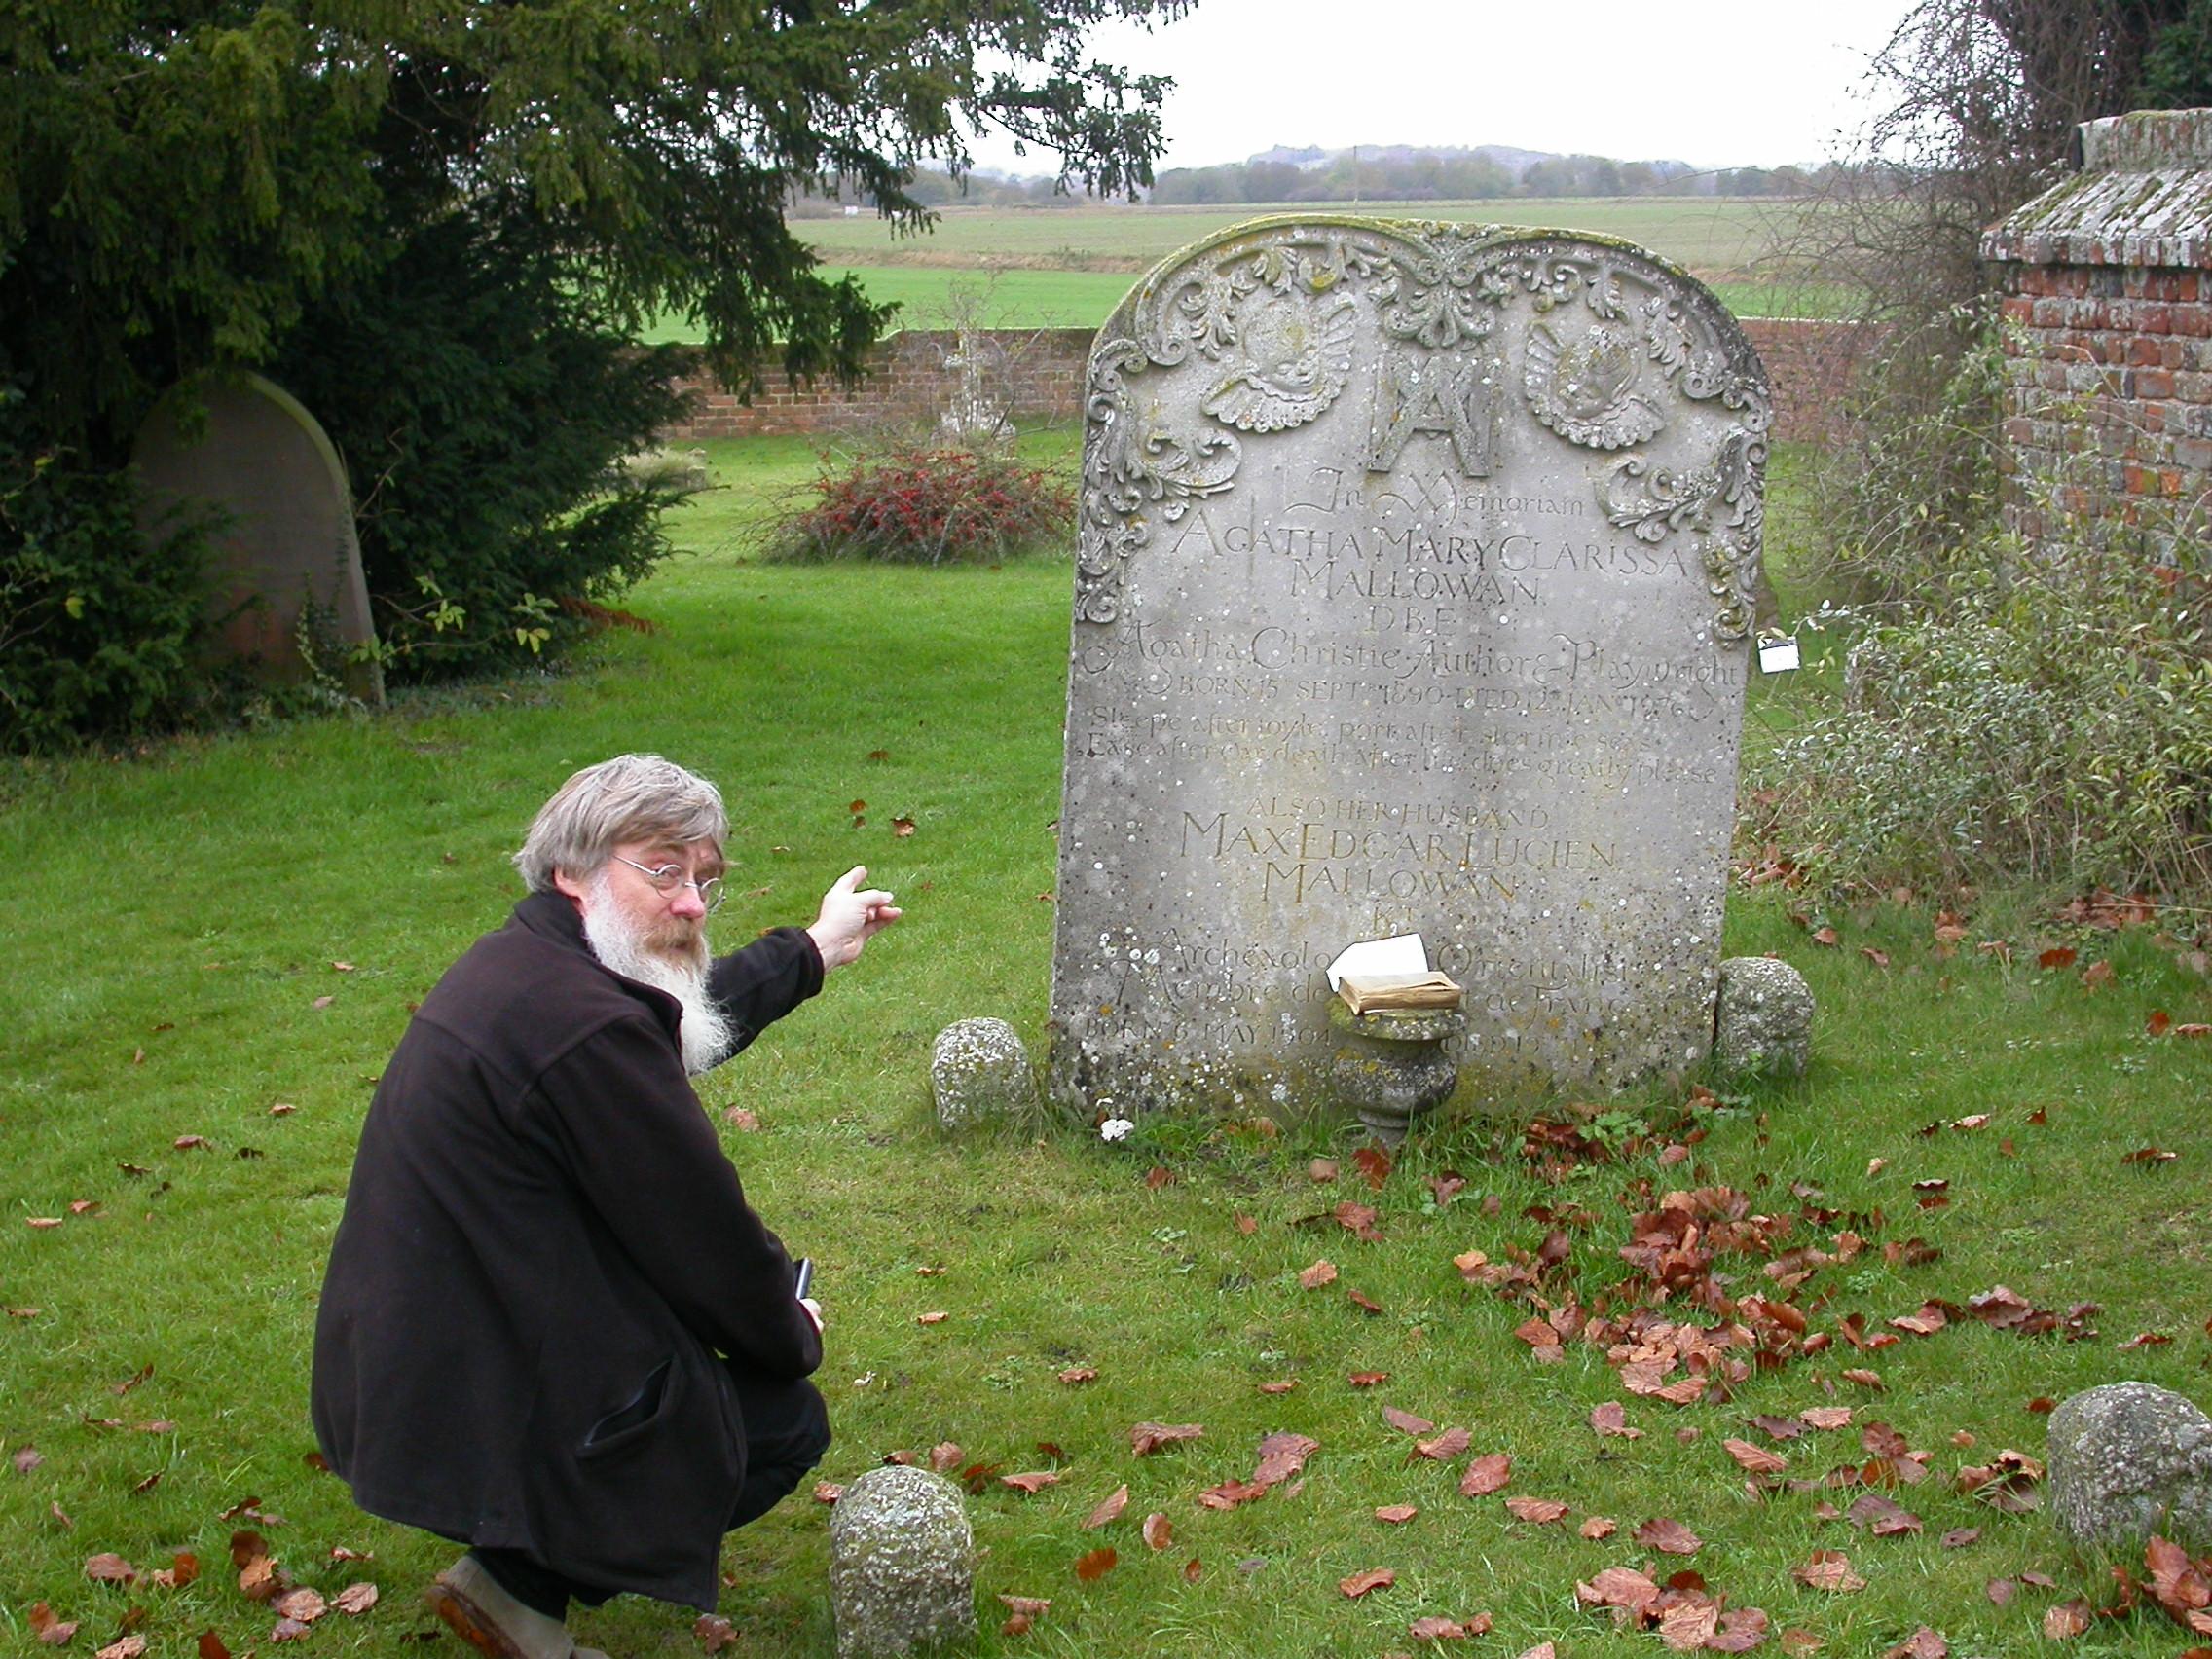 agatha christie grave